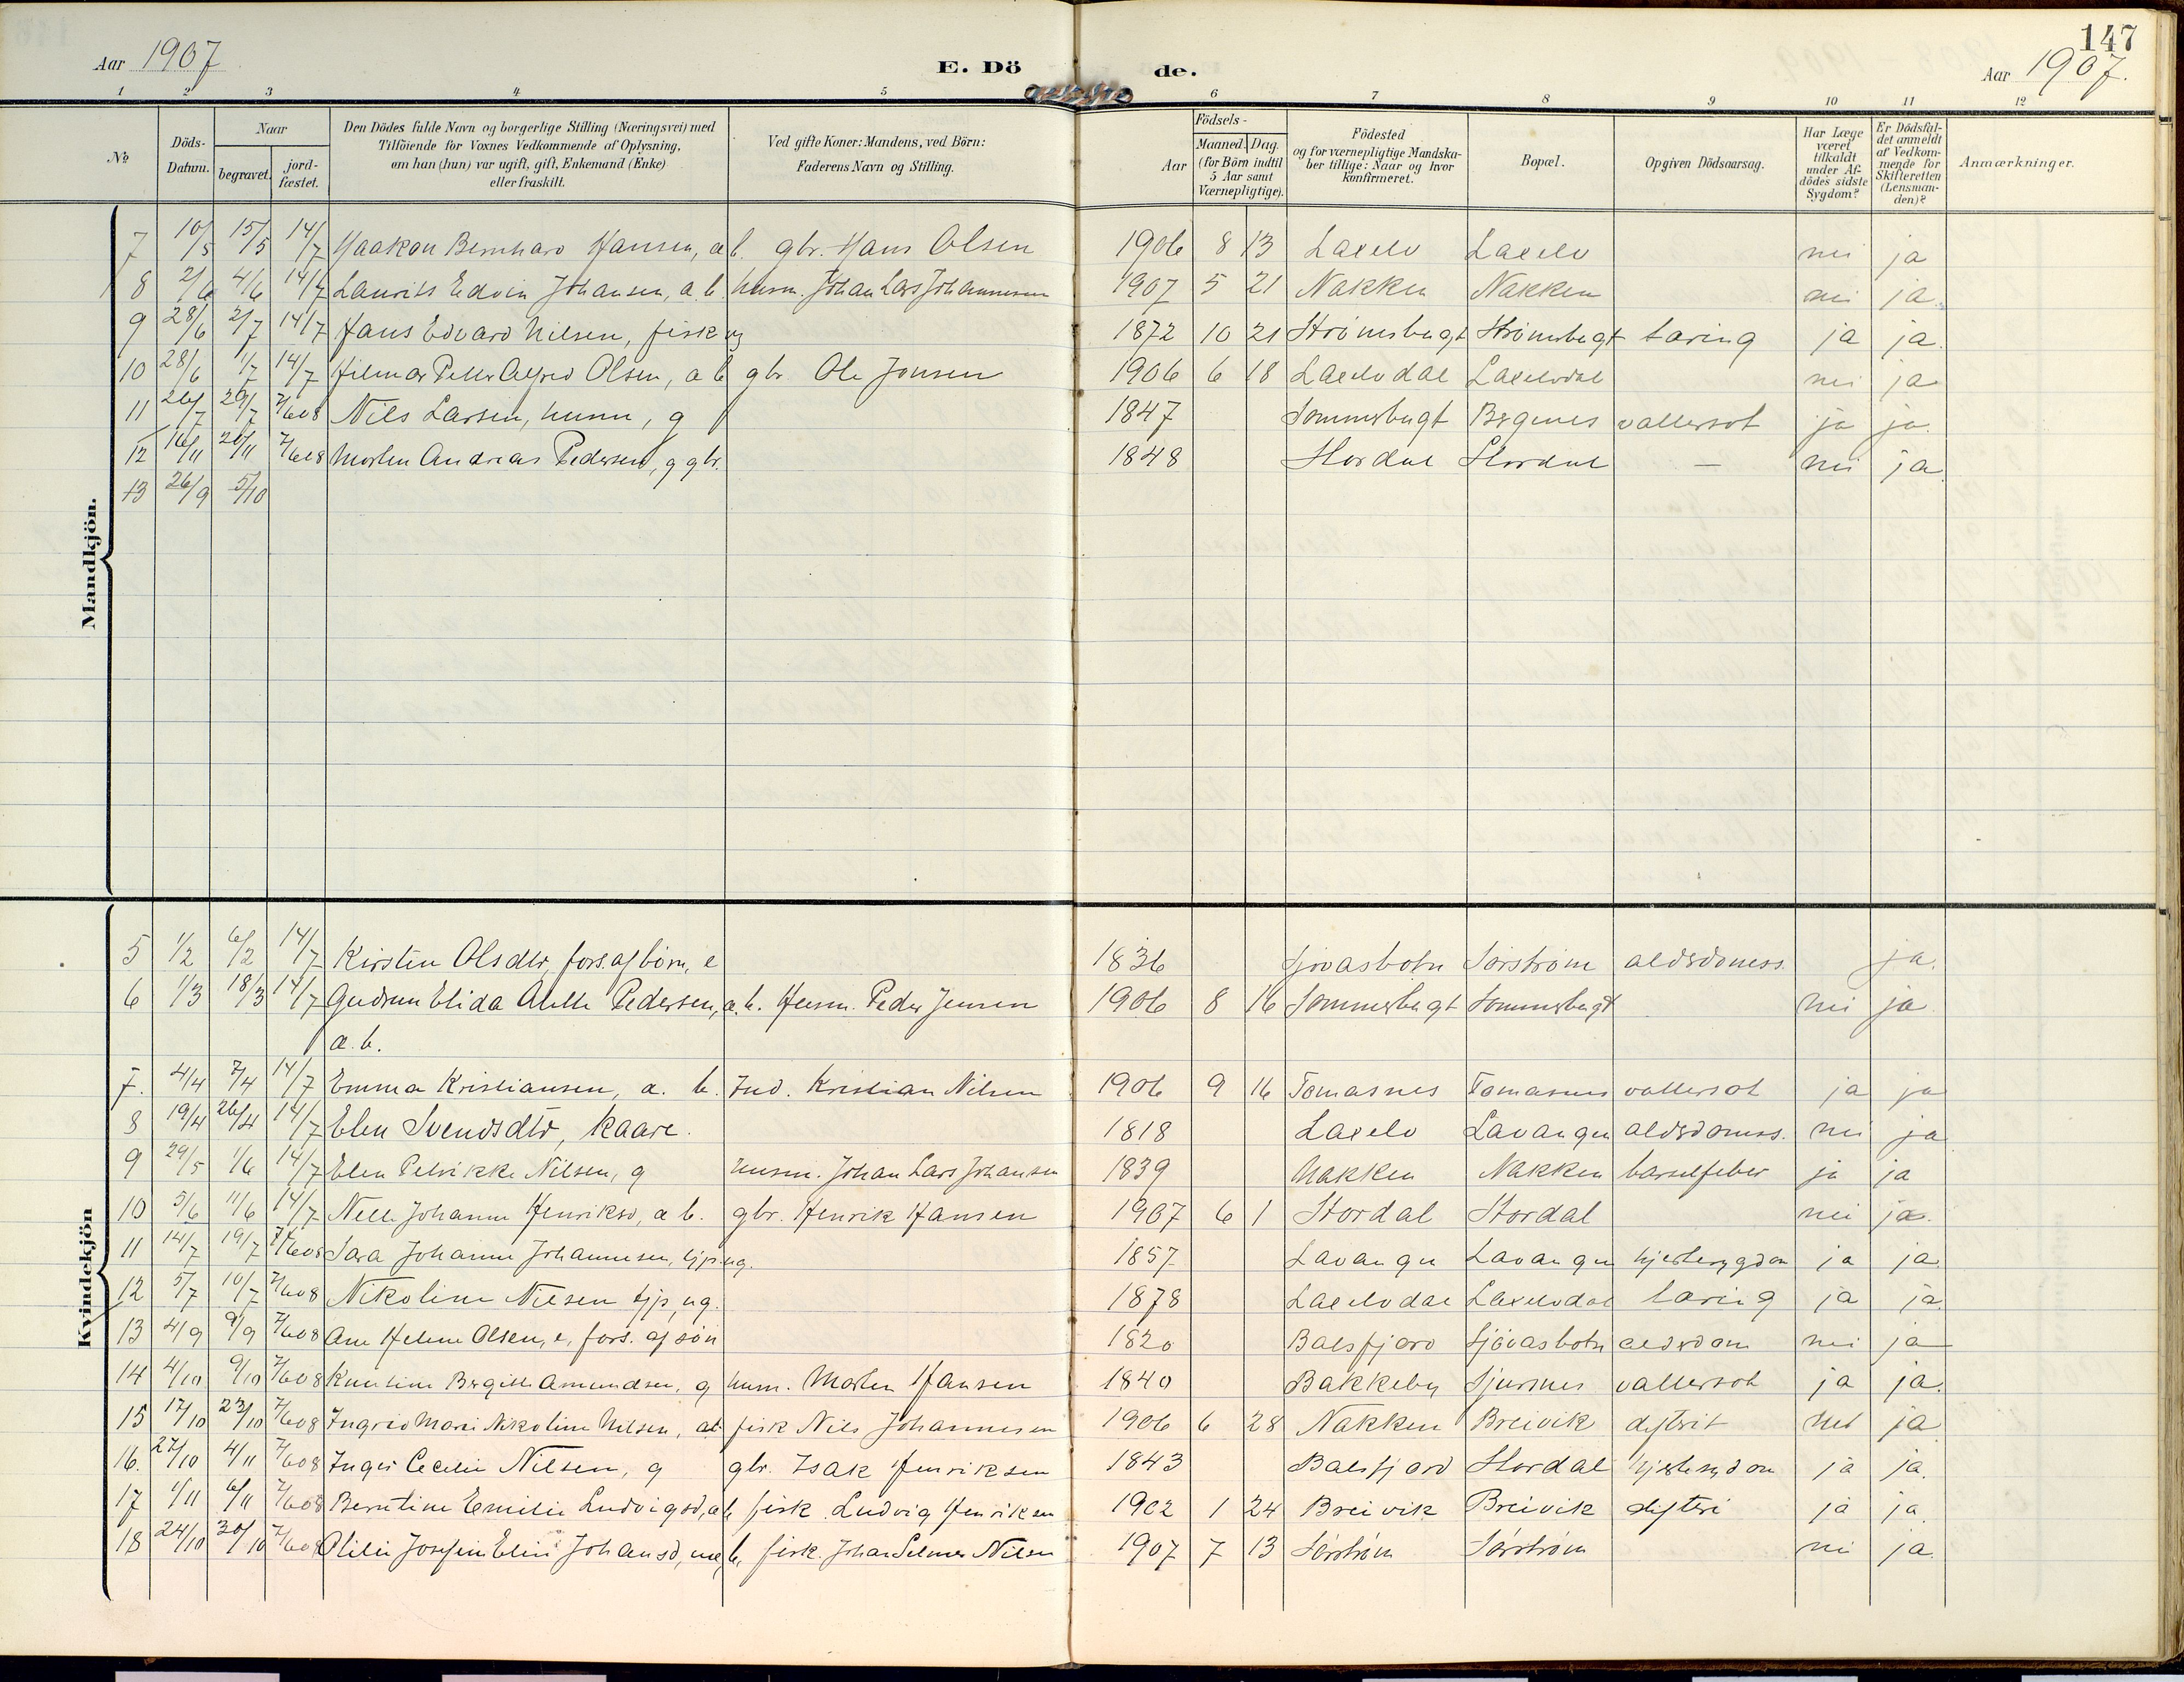 SATØ, Lyngen sokneprestembete, Ministerialbok nr. 14, 1905-1920, s. 147